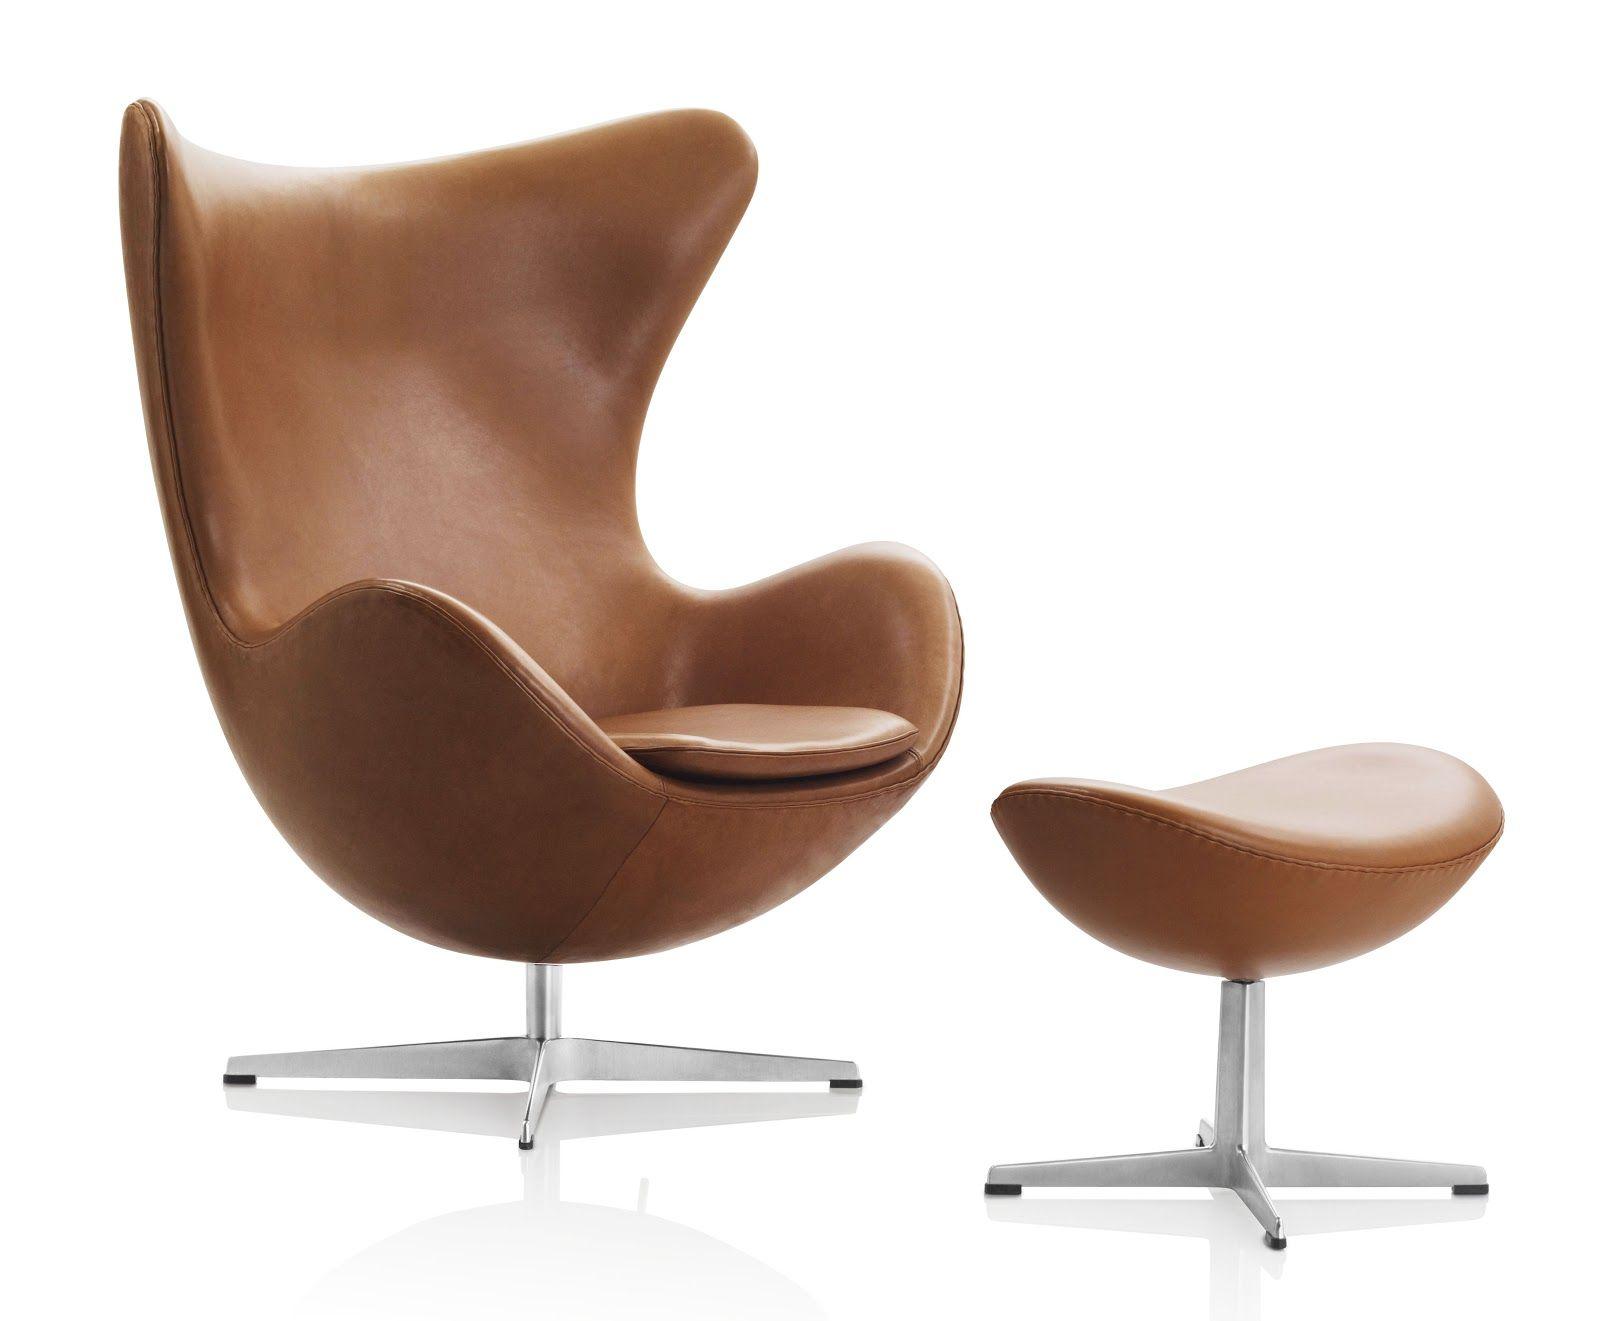 Arne Jacobsen Egg Chair in Walnut Leather   Stardust Modern Design